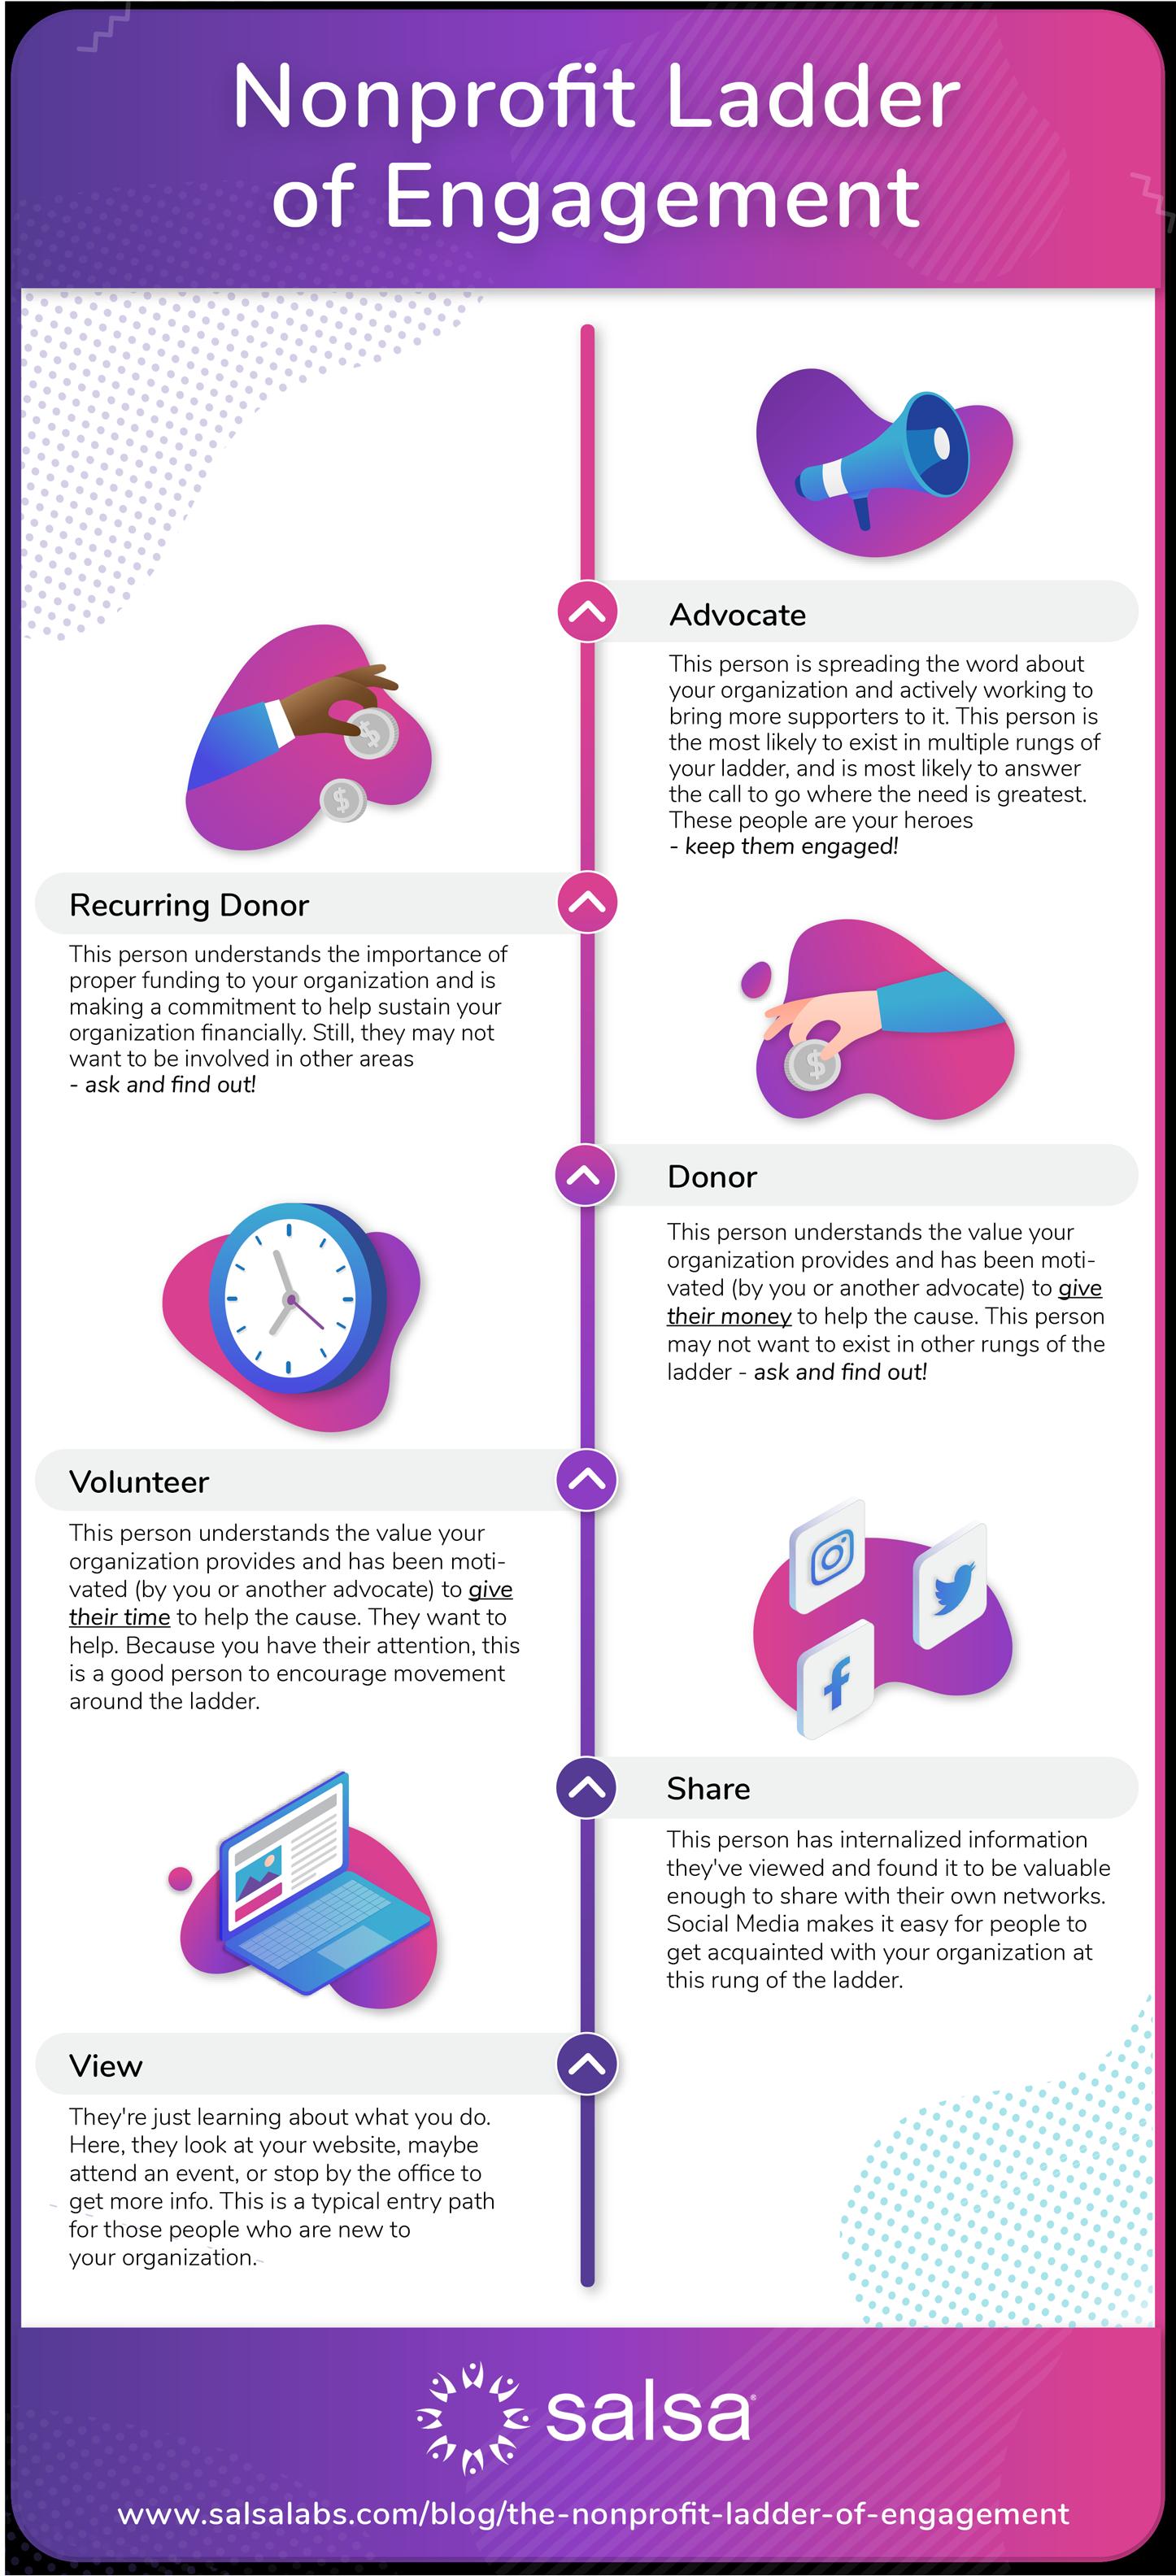 nonprofit ladder-of-engagement-01-ladder-infographic